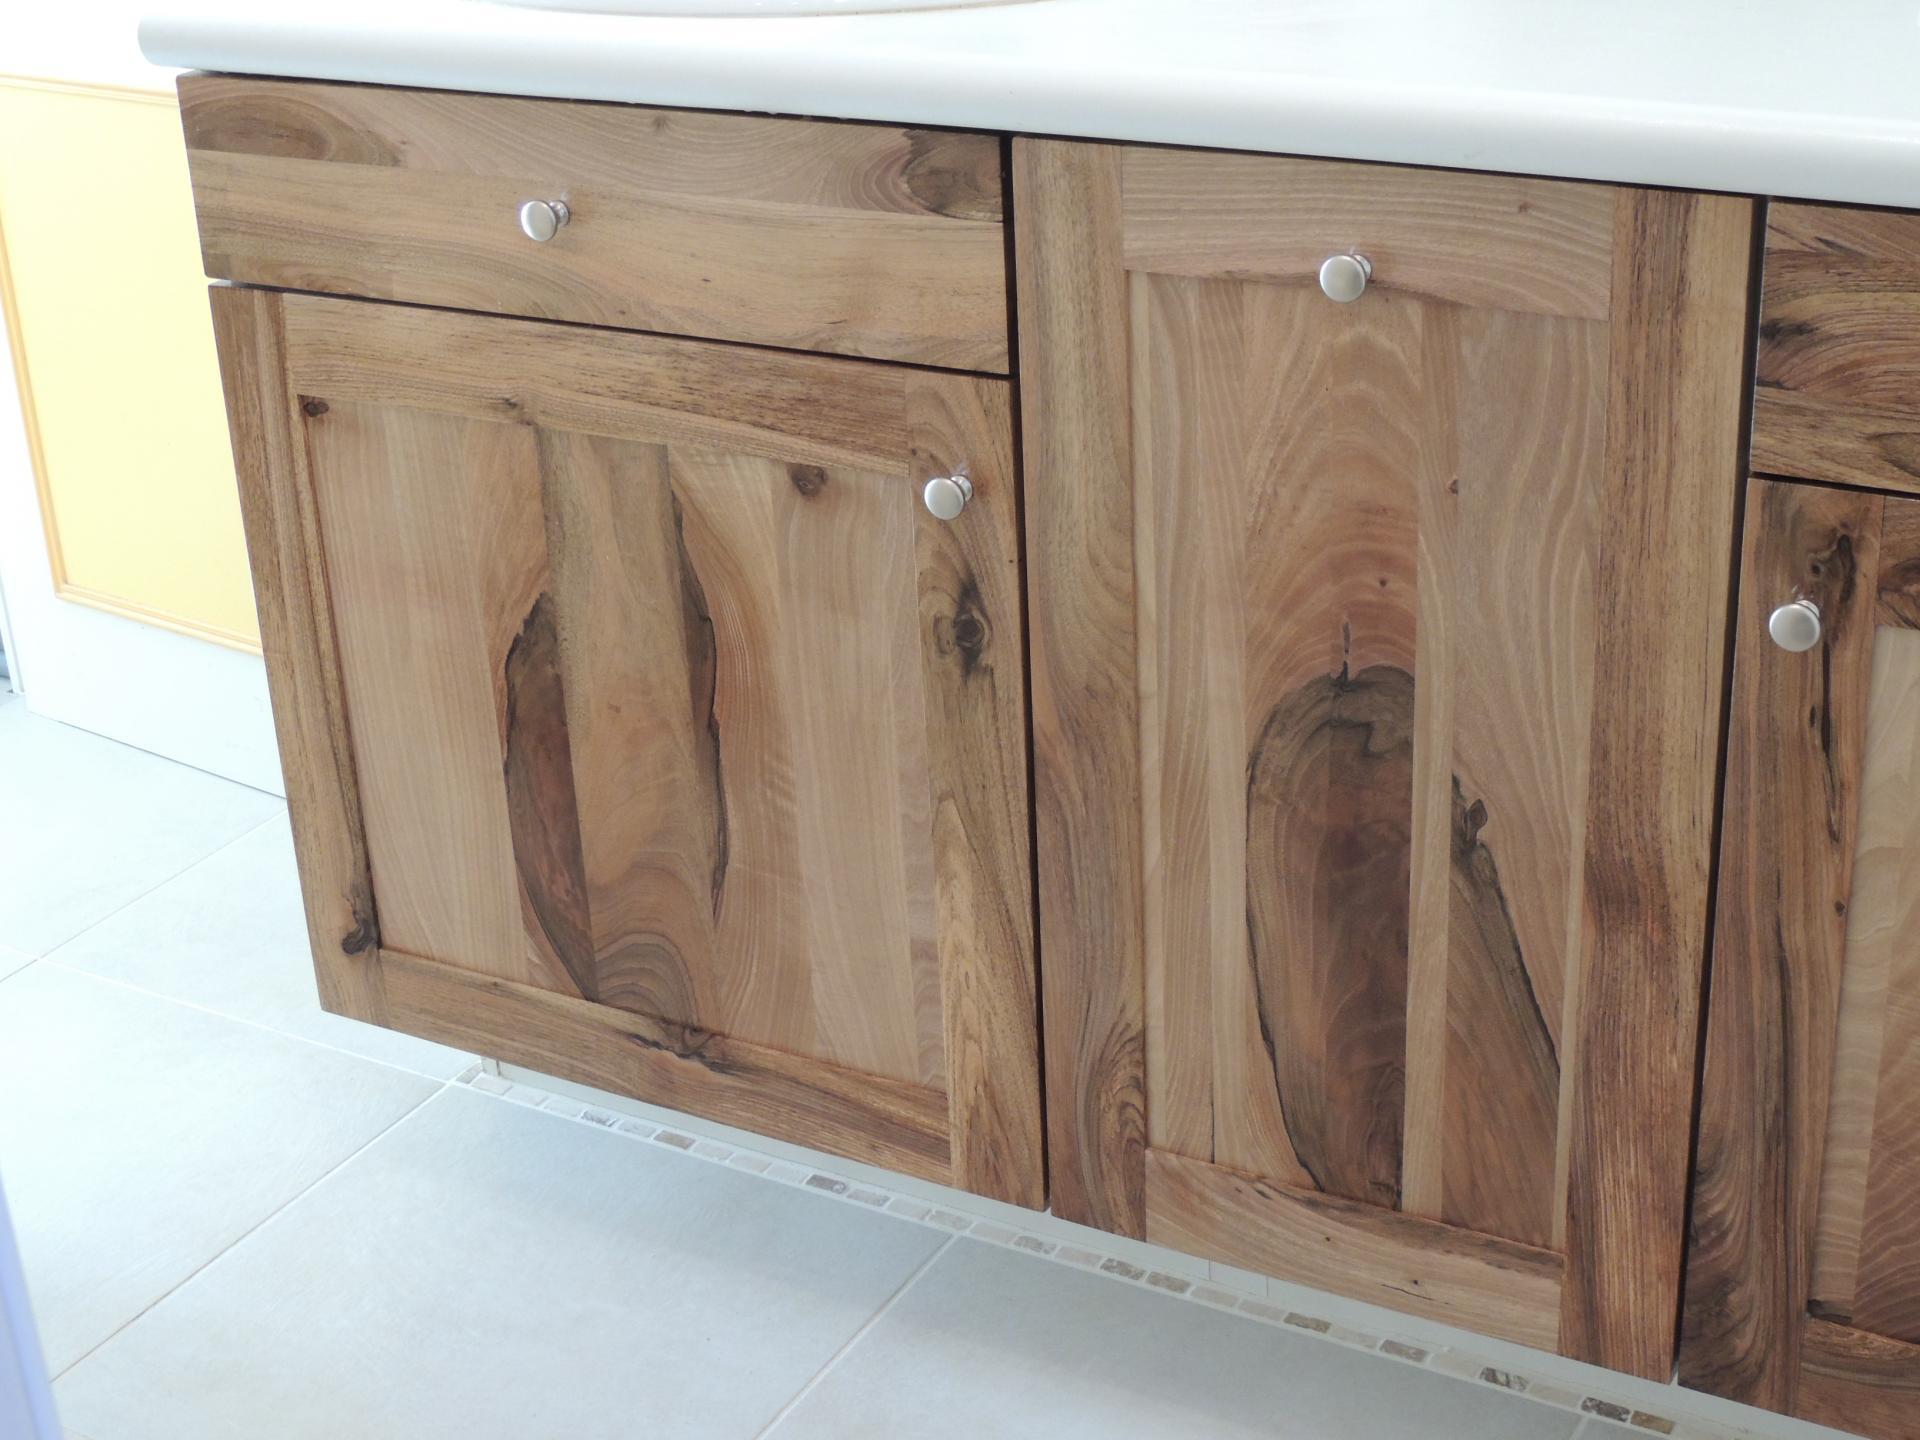 meuble salle de bain fabrication allemande. Black Bedroom Furniture Sets. Home Design Ideas